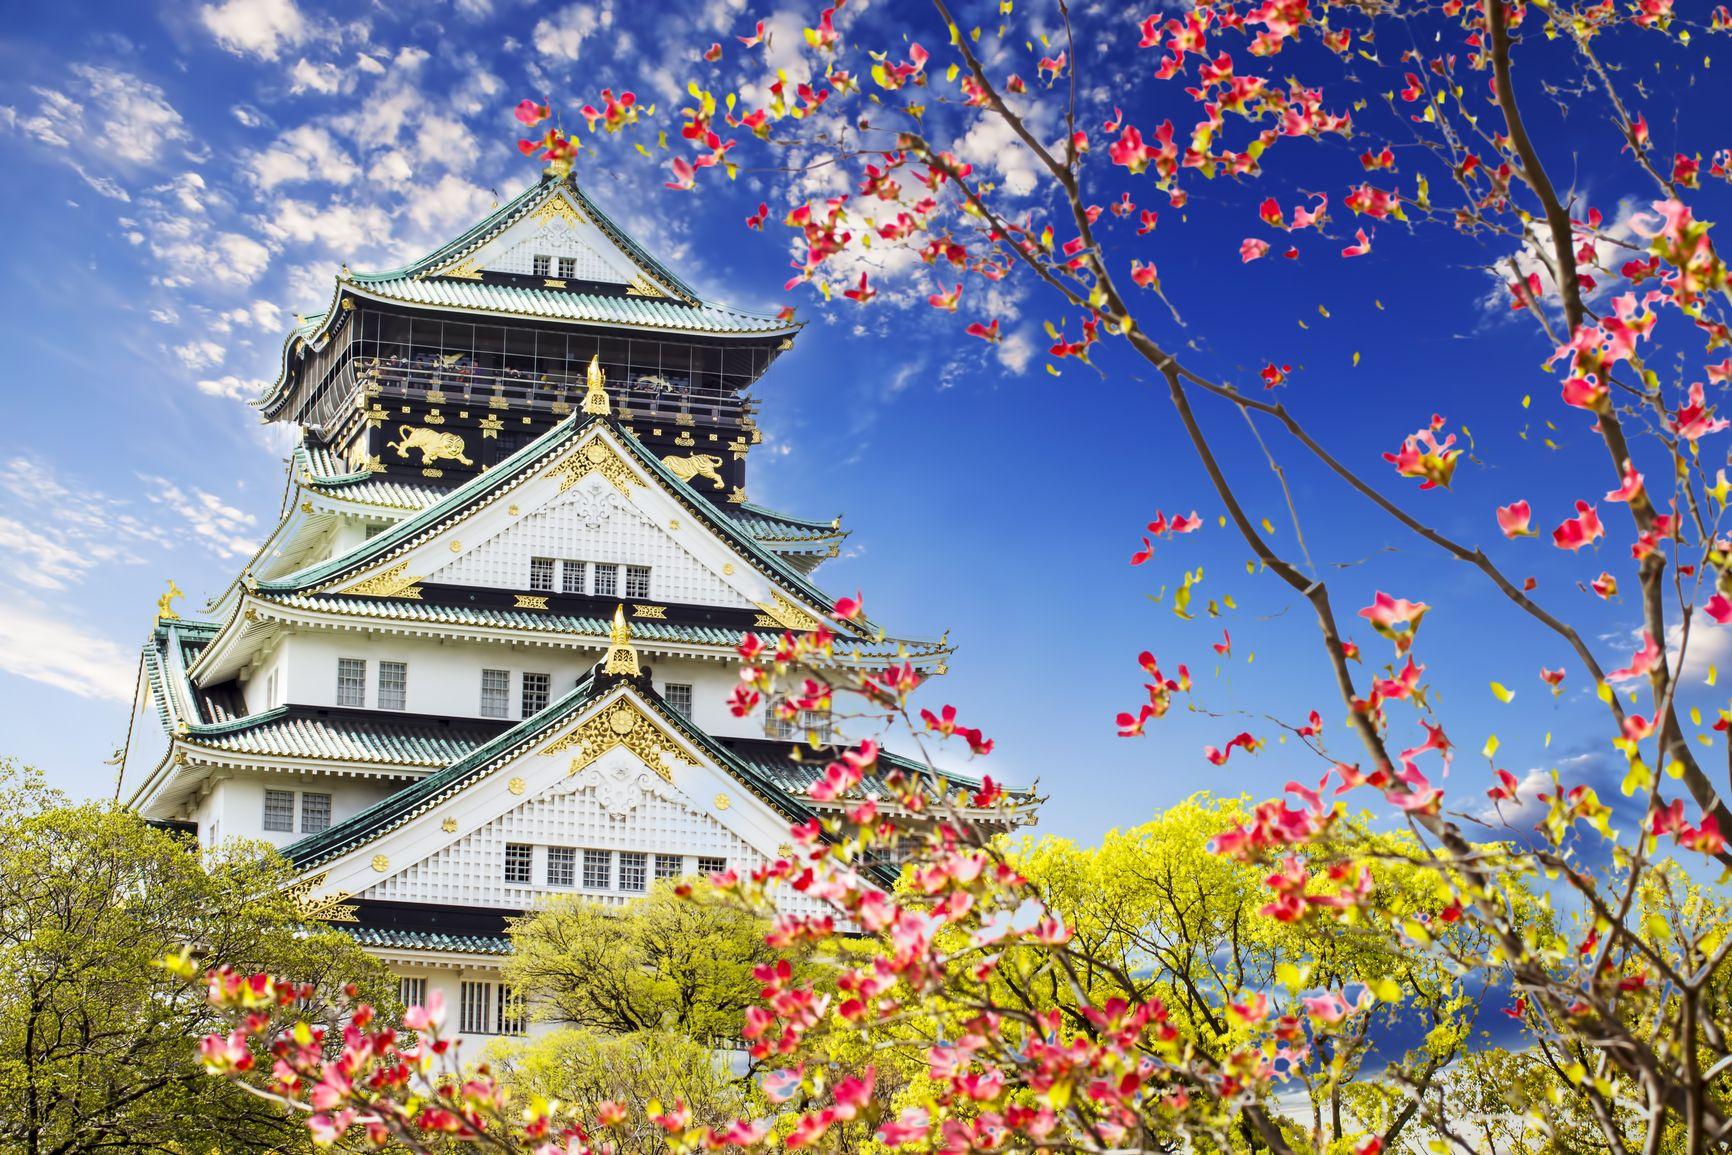 Vol aller-retour: Montréal - Osaka pour $987! #yulair #voyage